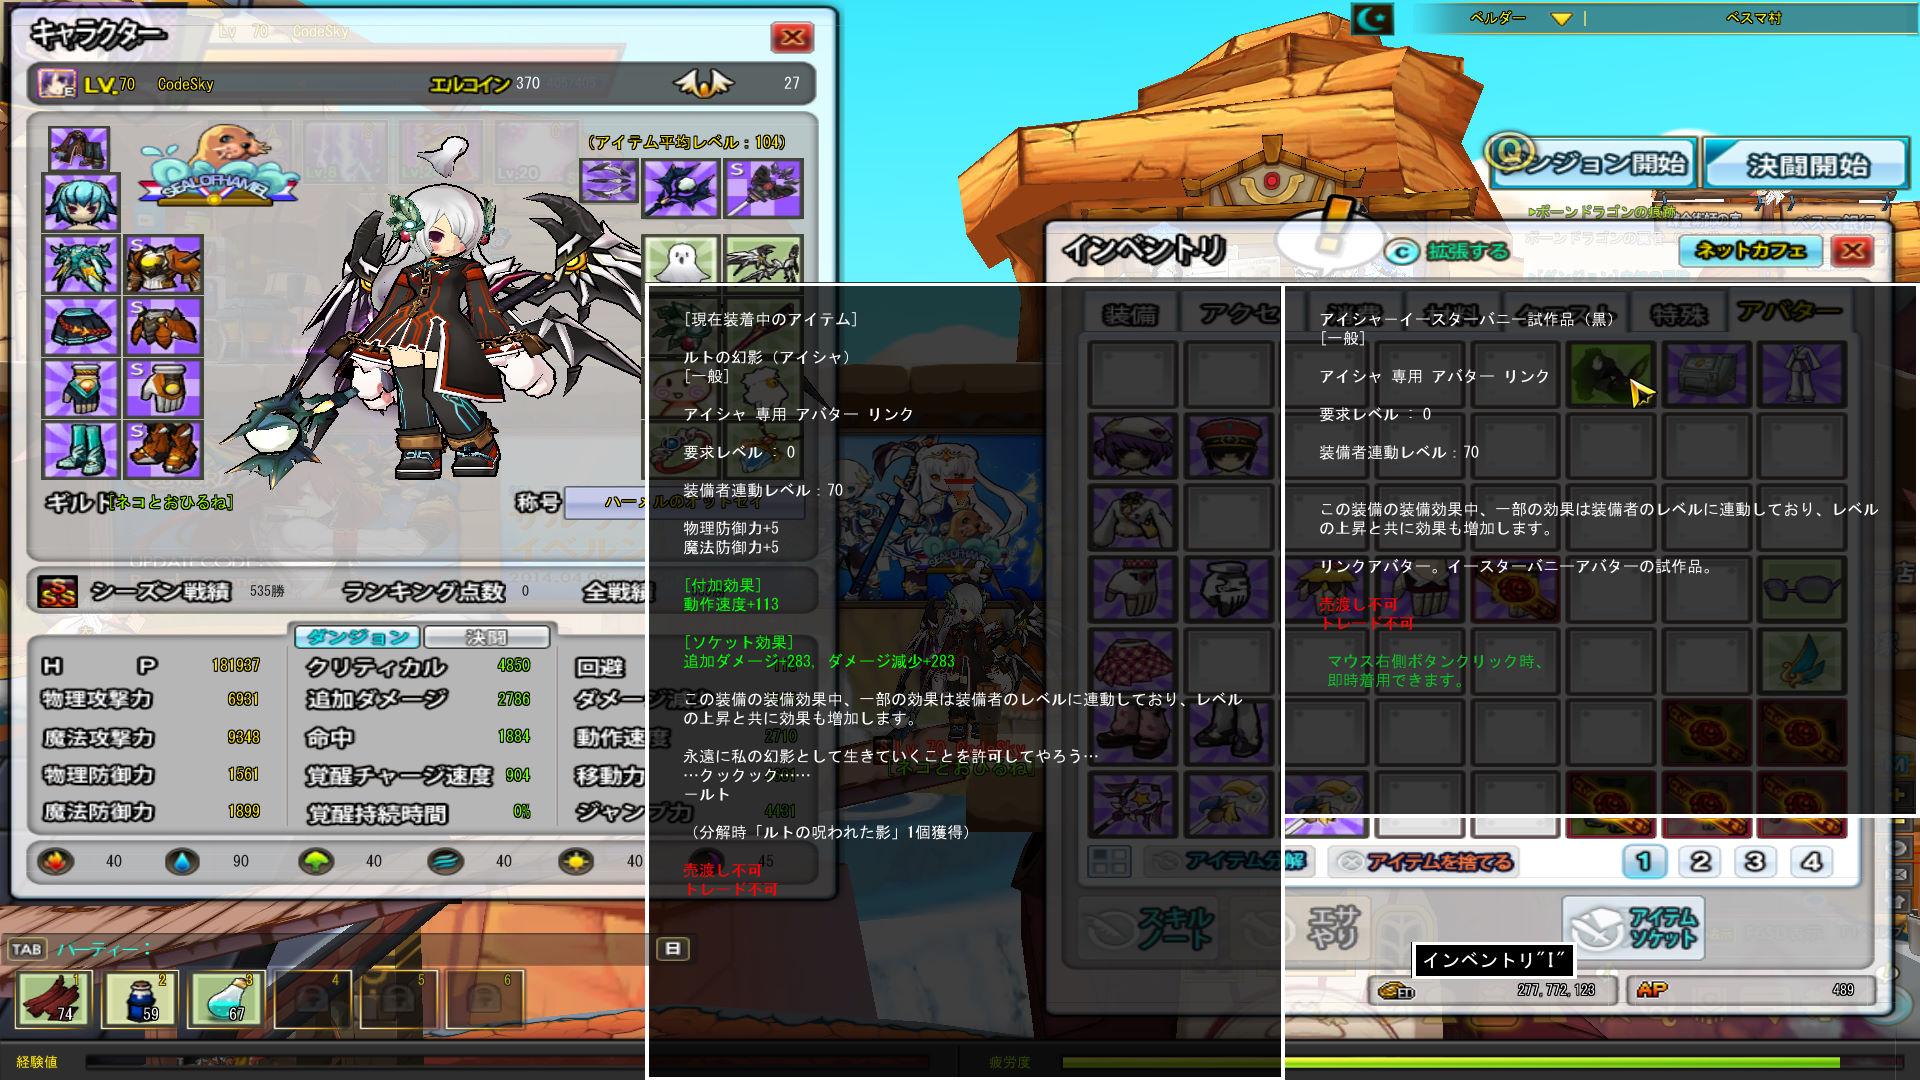 SC_ 2014-04-20 18-50-24-402